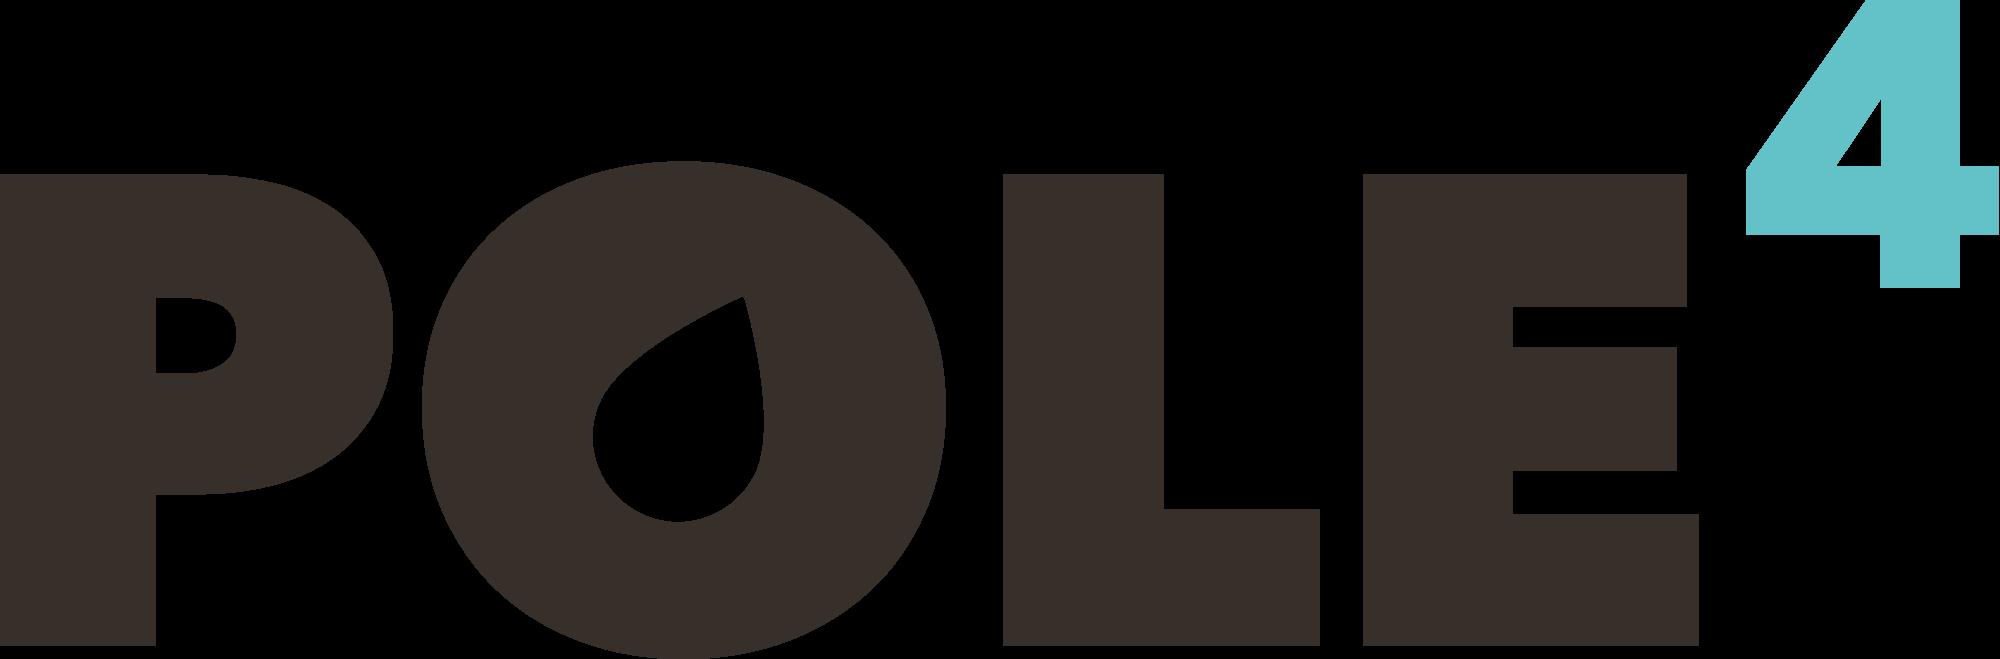 Pole4